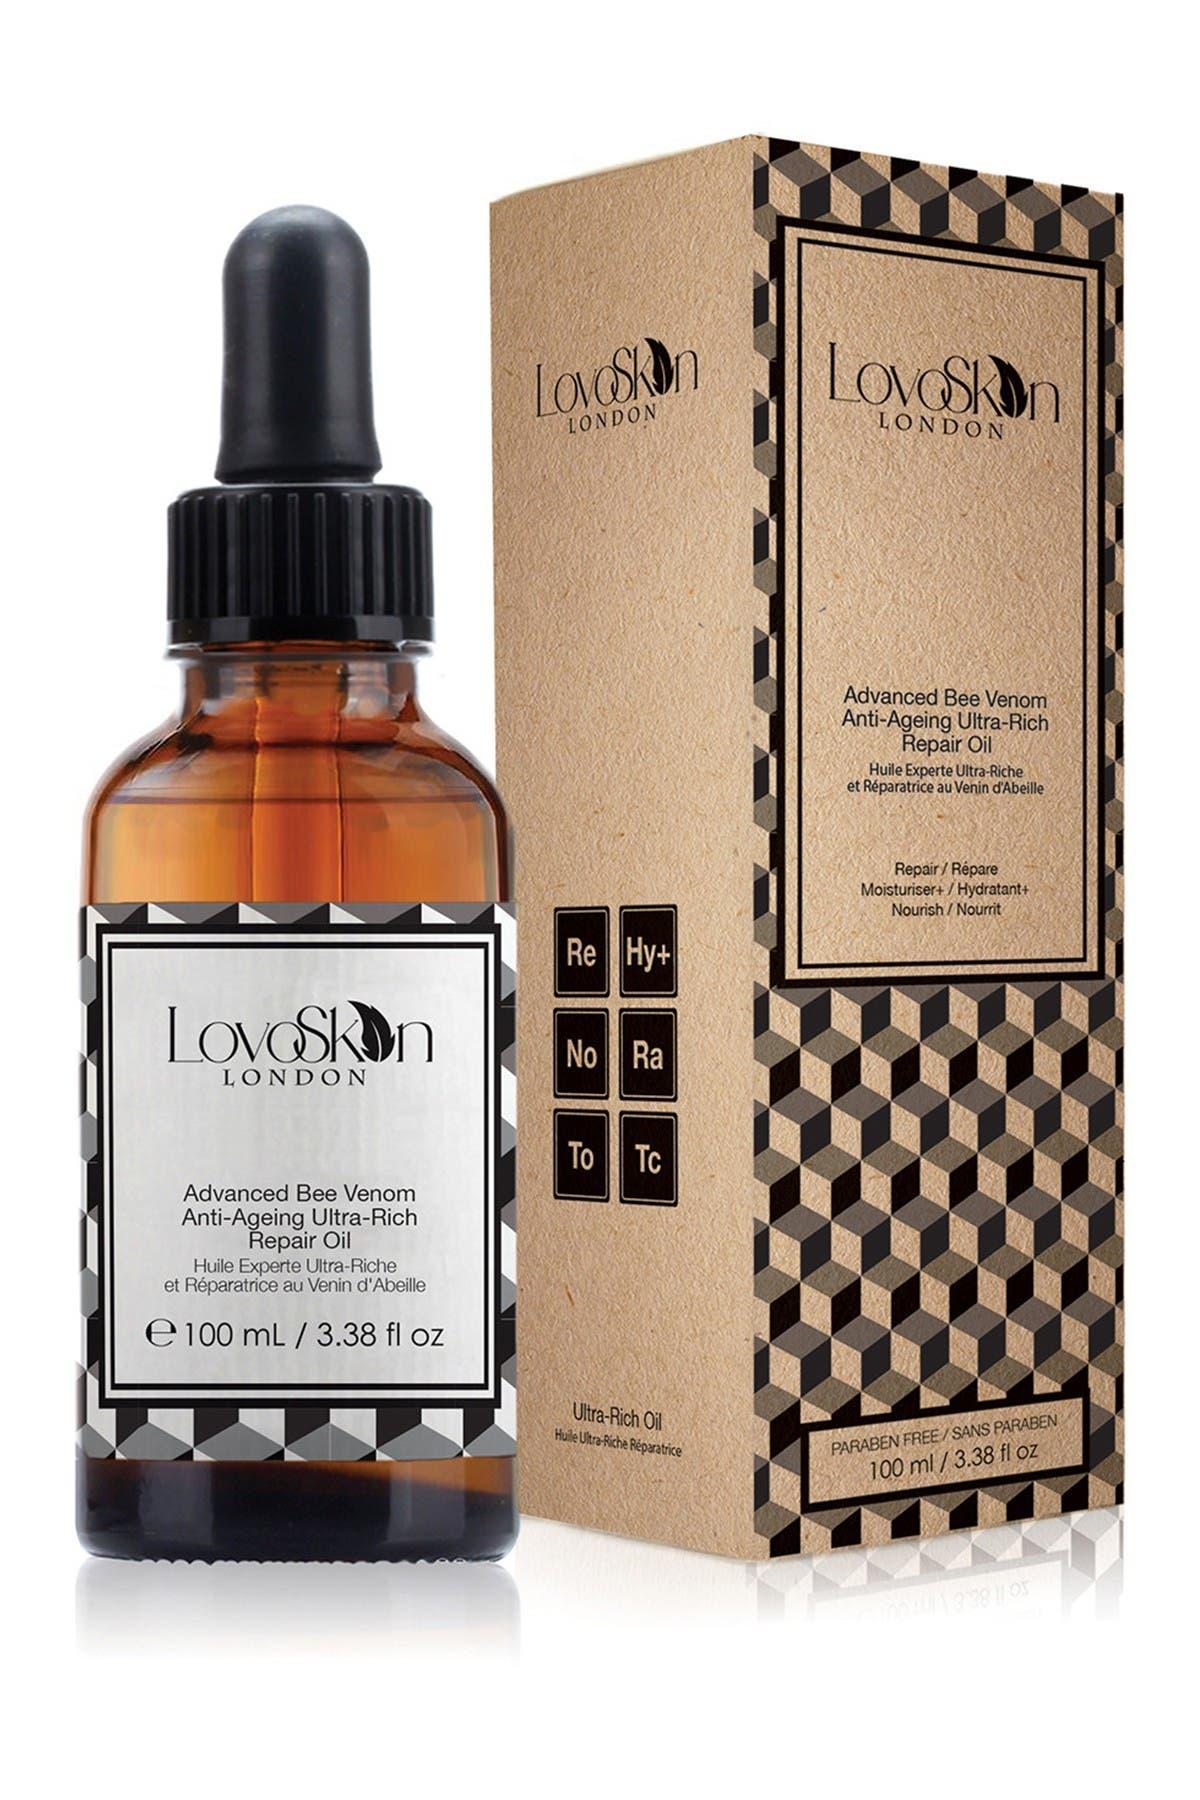 Image of LOVOSKIN Advanced Bee Venom Wrinkle Reducer Ultra-Rich Repair Oil